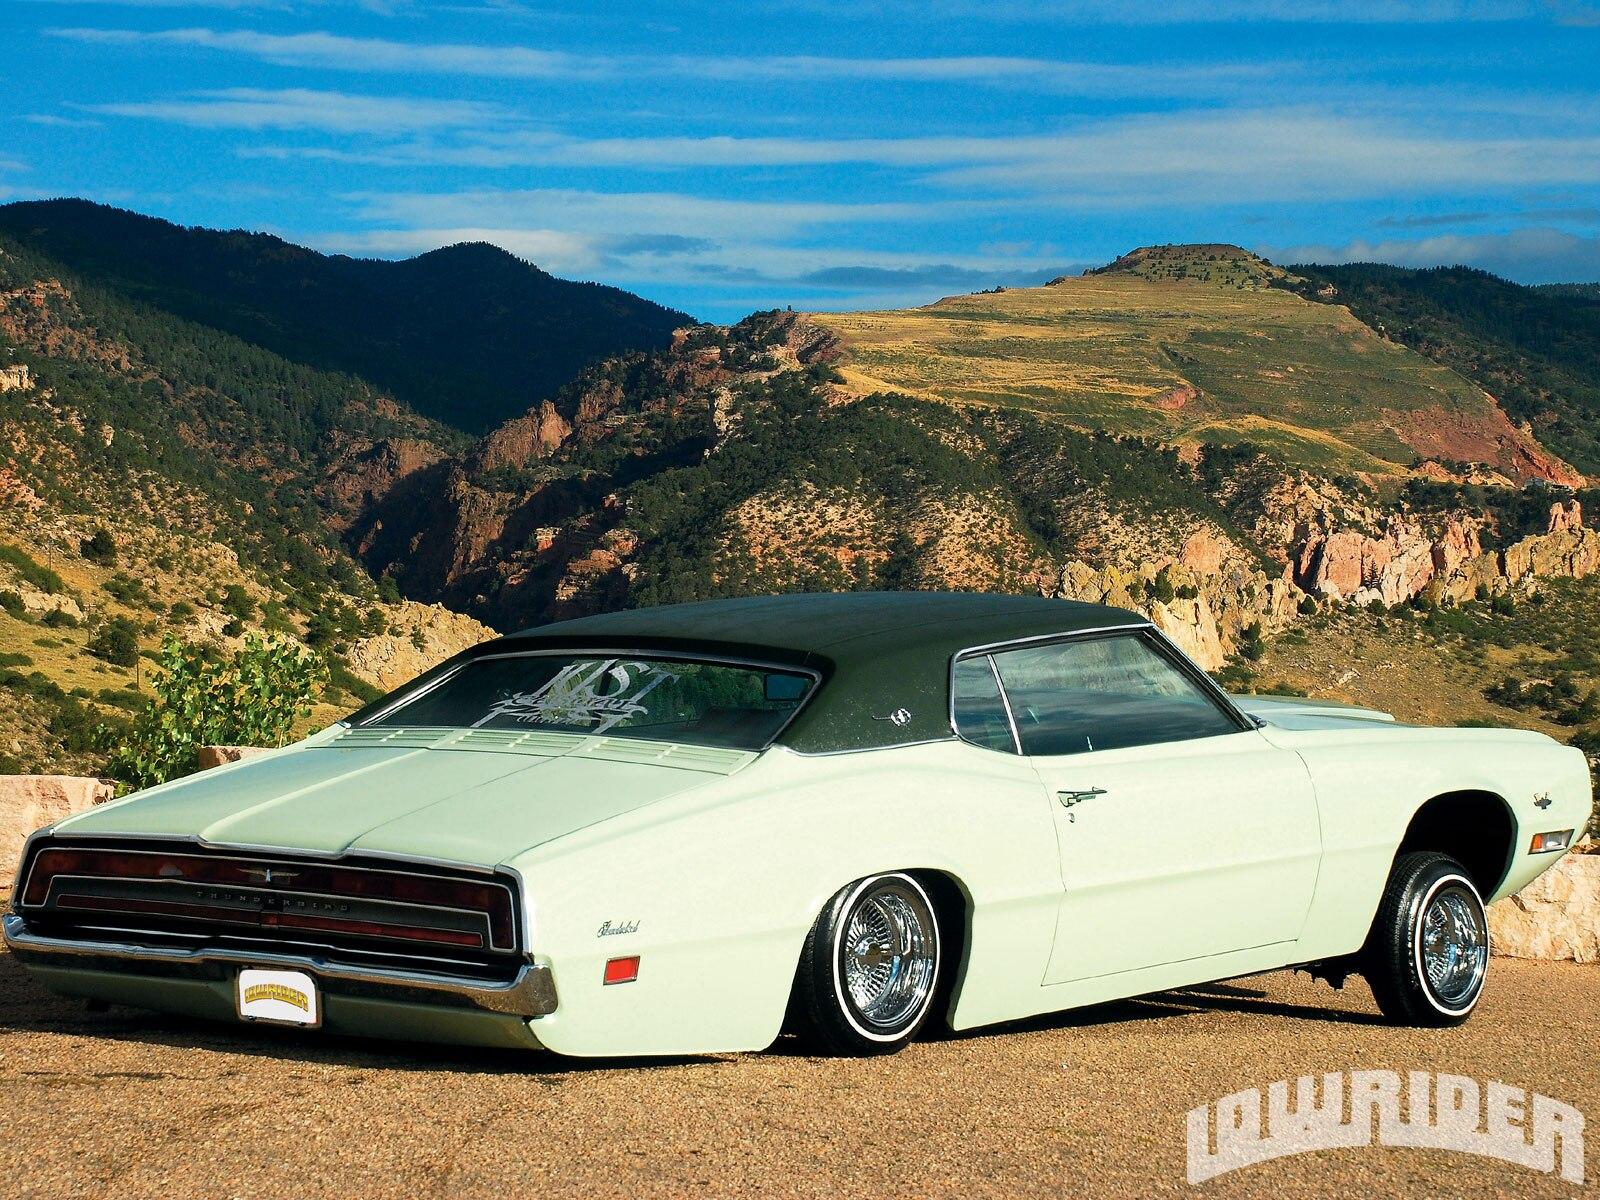 1971 Ford Thunderbird - Lowrider Magazine